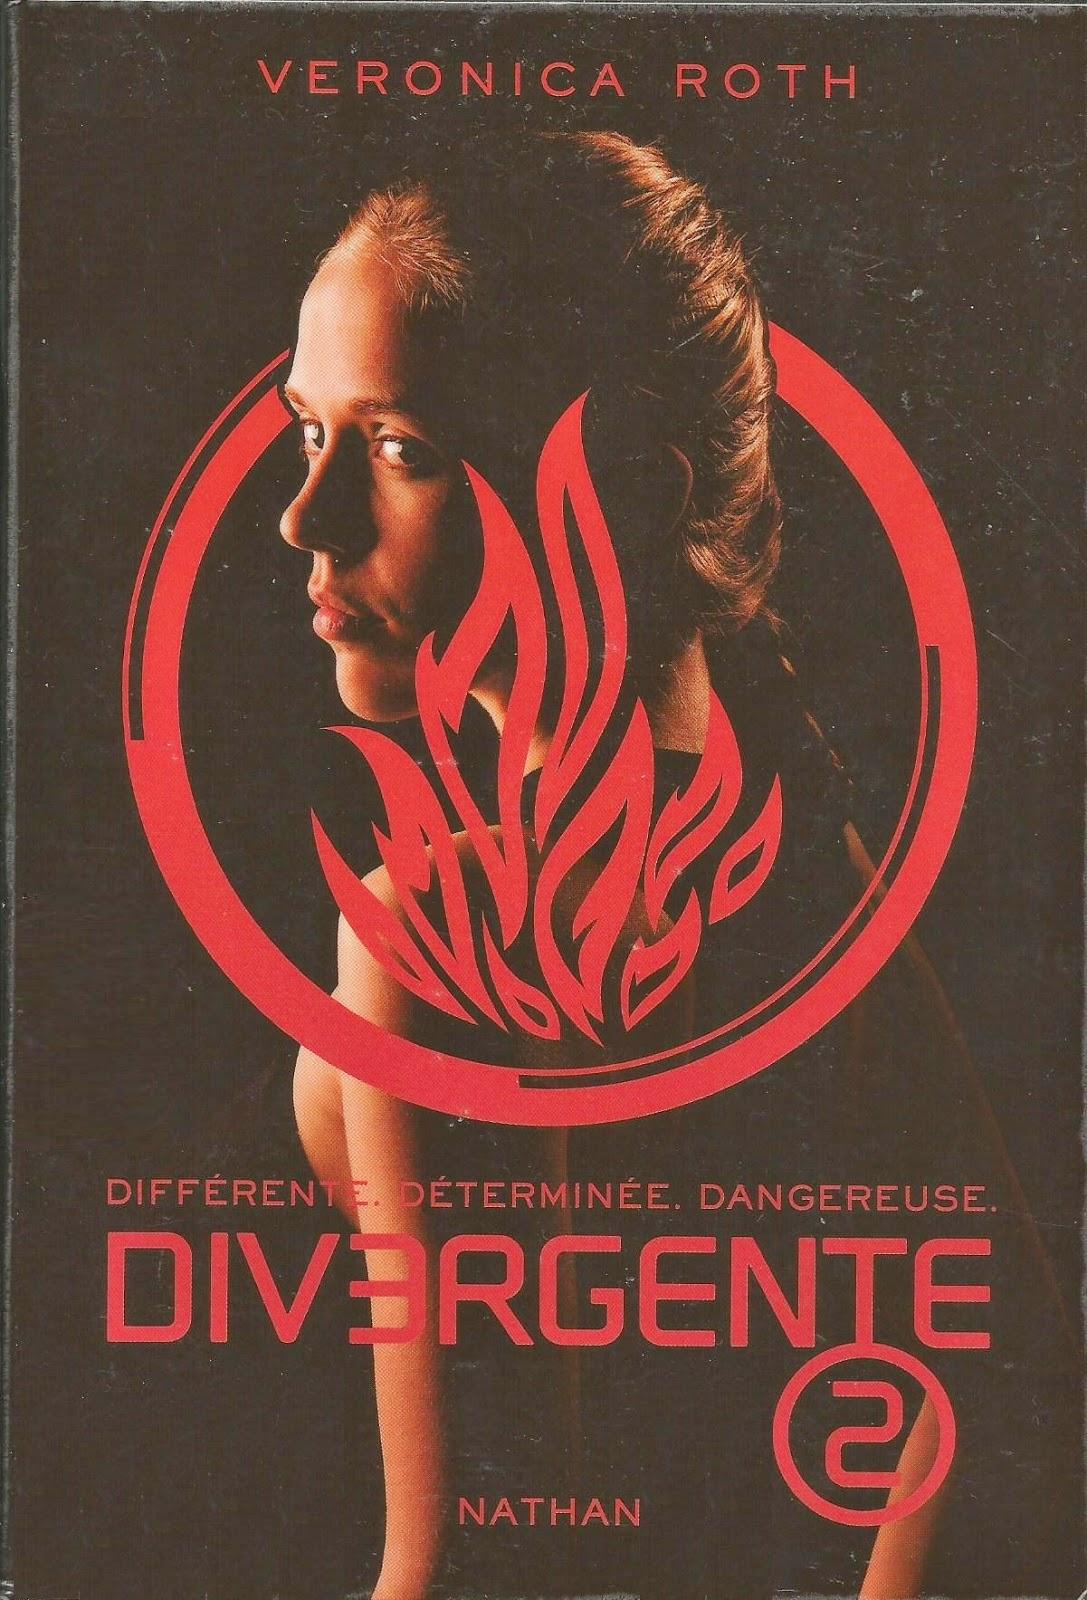 Divergente Veronica Roth cover